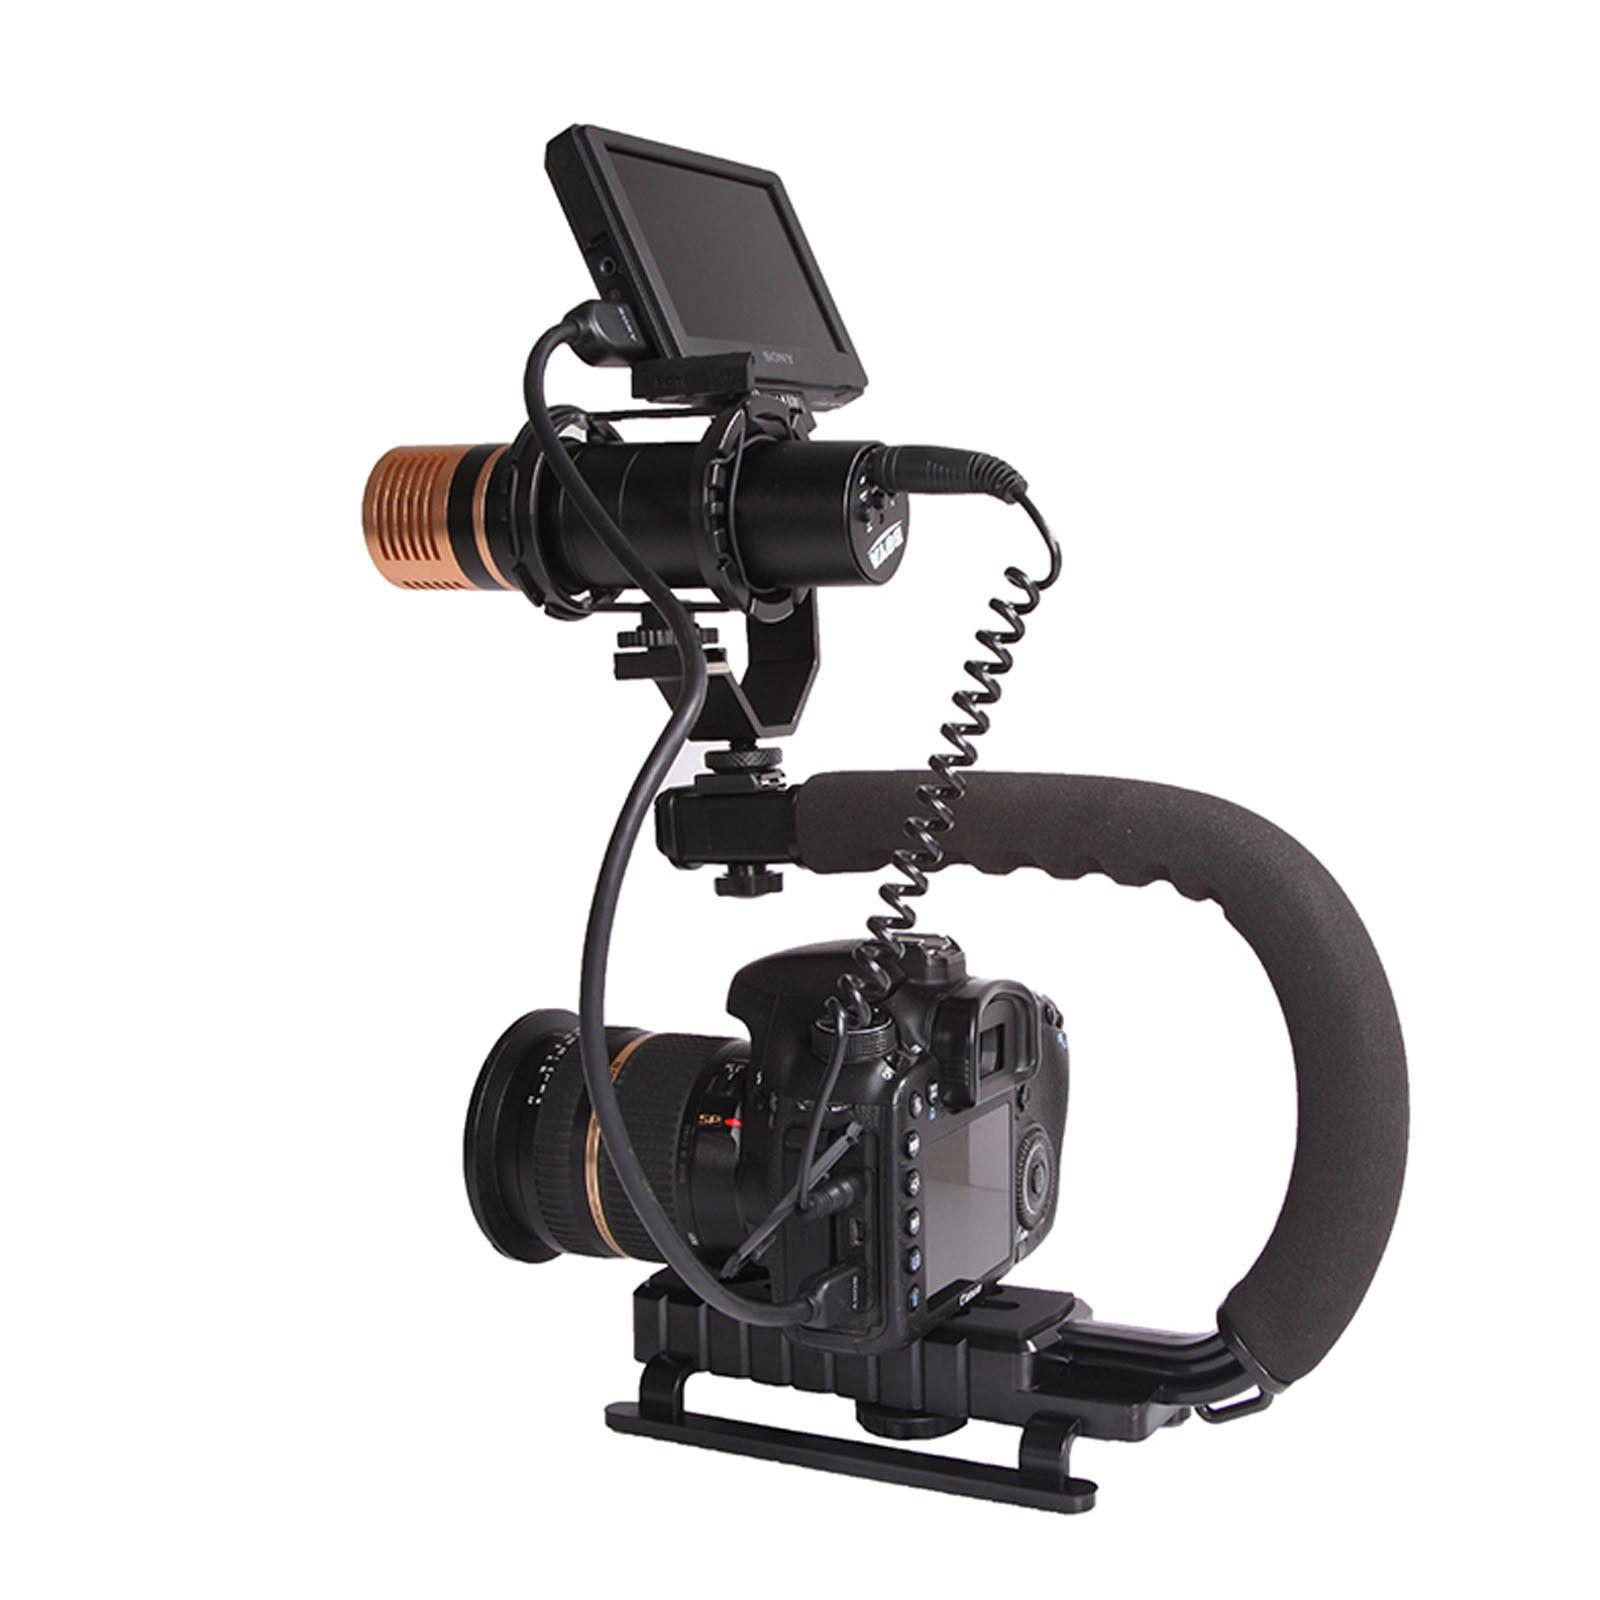 Video Camera Stabilizer >> Stabilizer C Shape Bracket Video Handheld Grip Fit For Camera